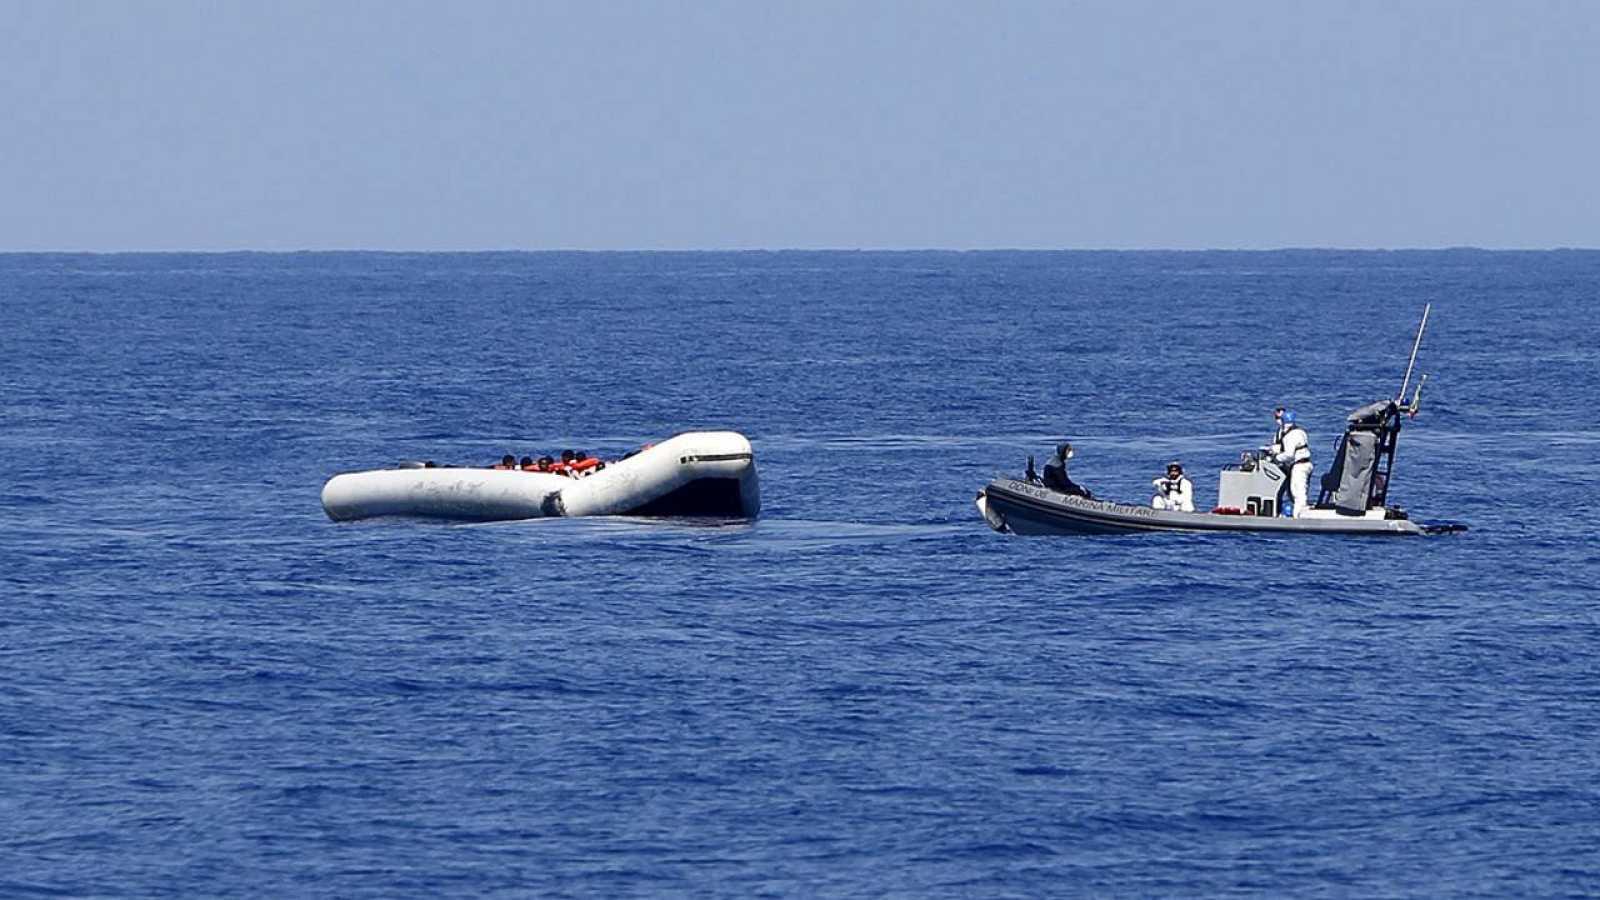 "Una lancha del barco italiano ""Francesco Mimbelli"" rescata a varias personas de una barca hinchable frente a la costa de Libia, el 6 de agosto. REUTERS/Darrin Zammit Lupi"